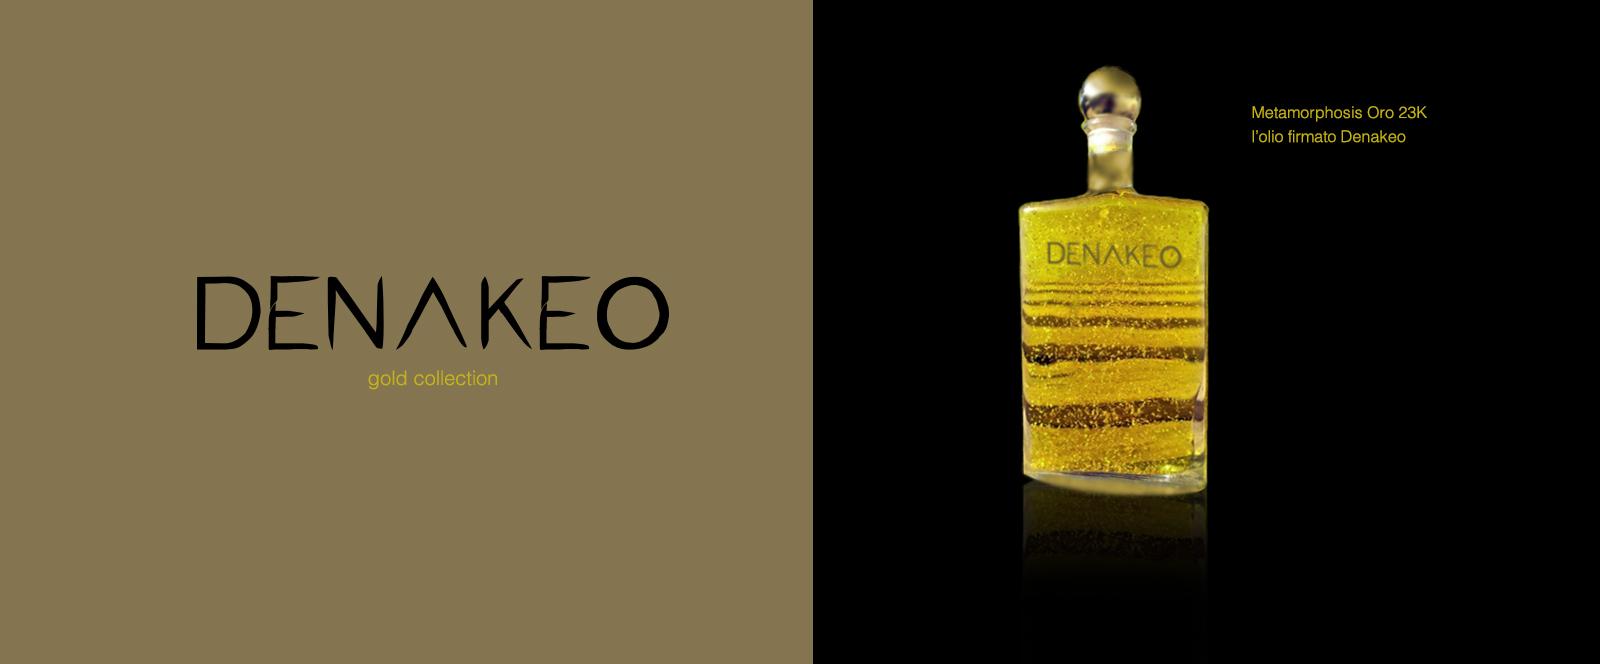 Denakeo gold olive oil